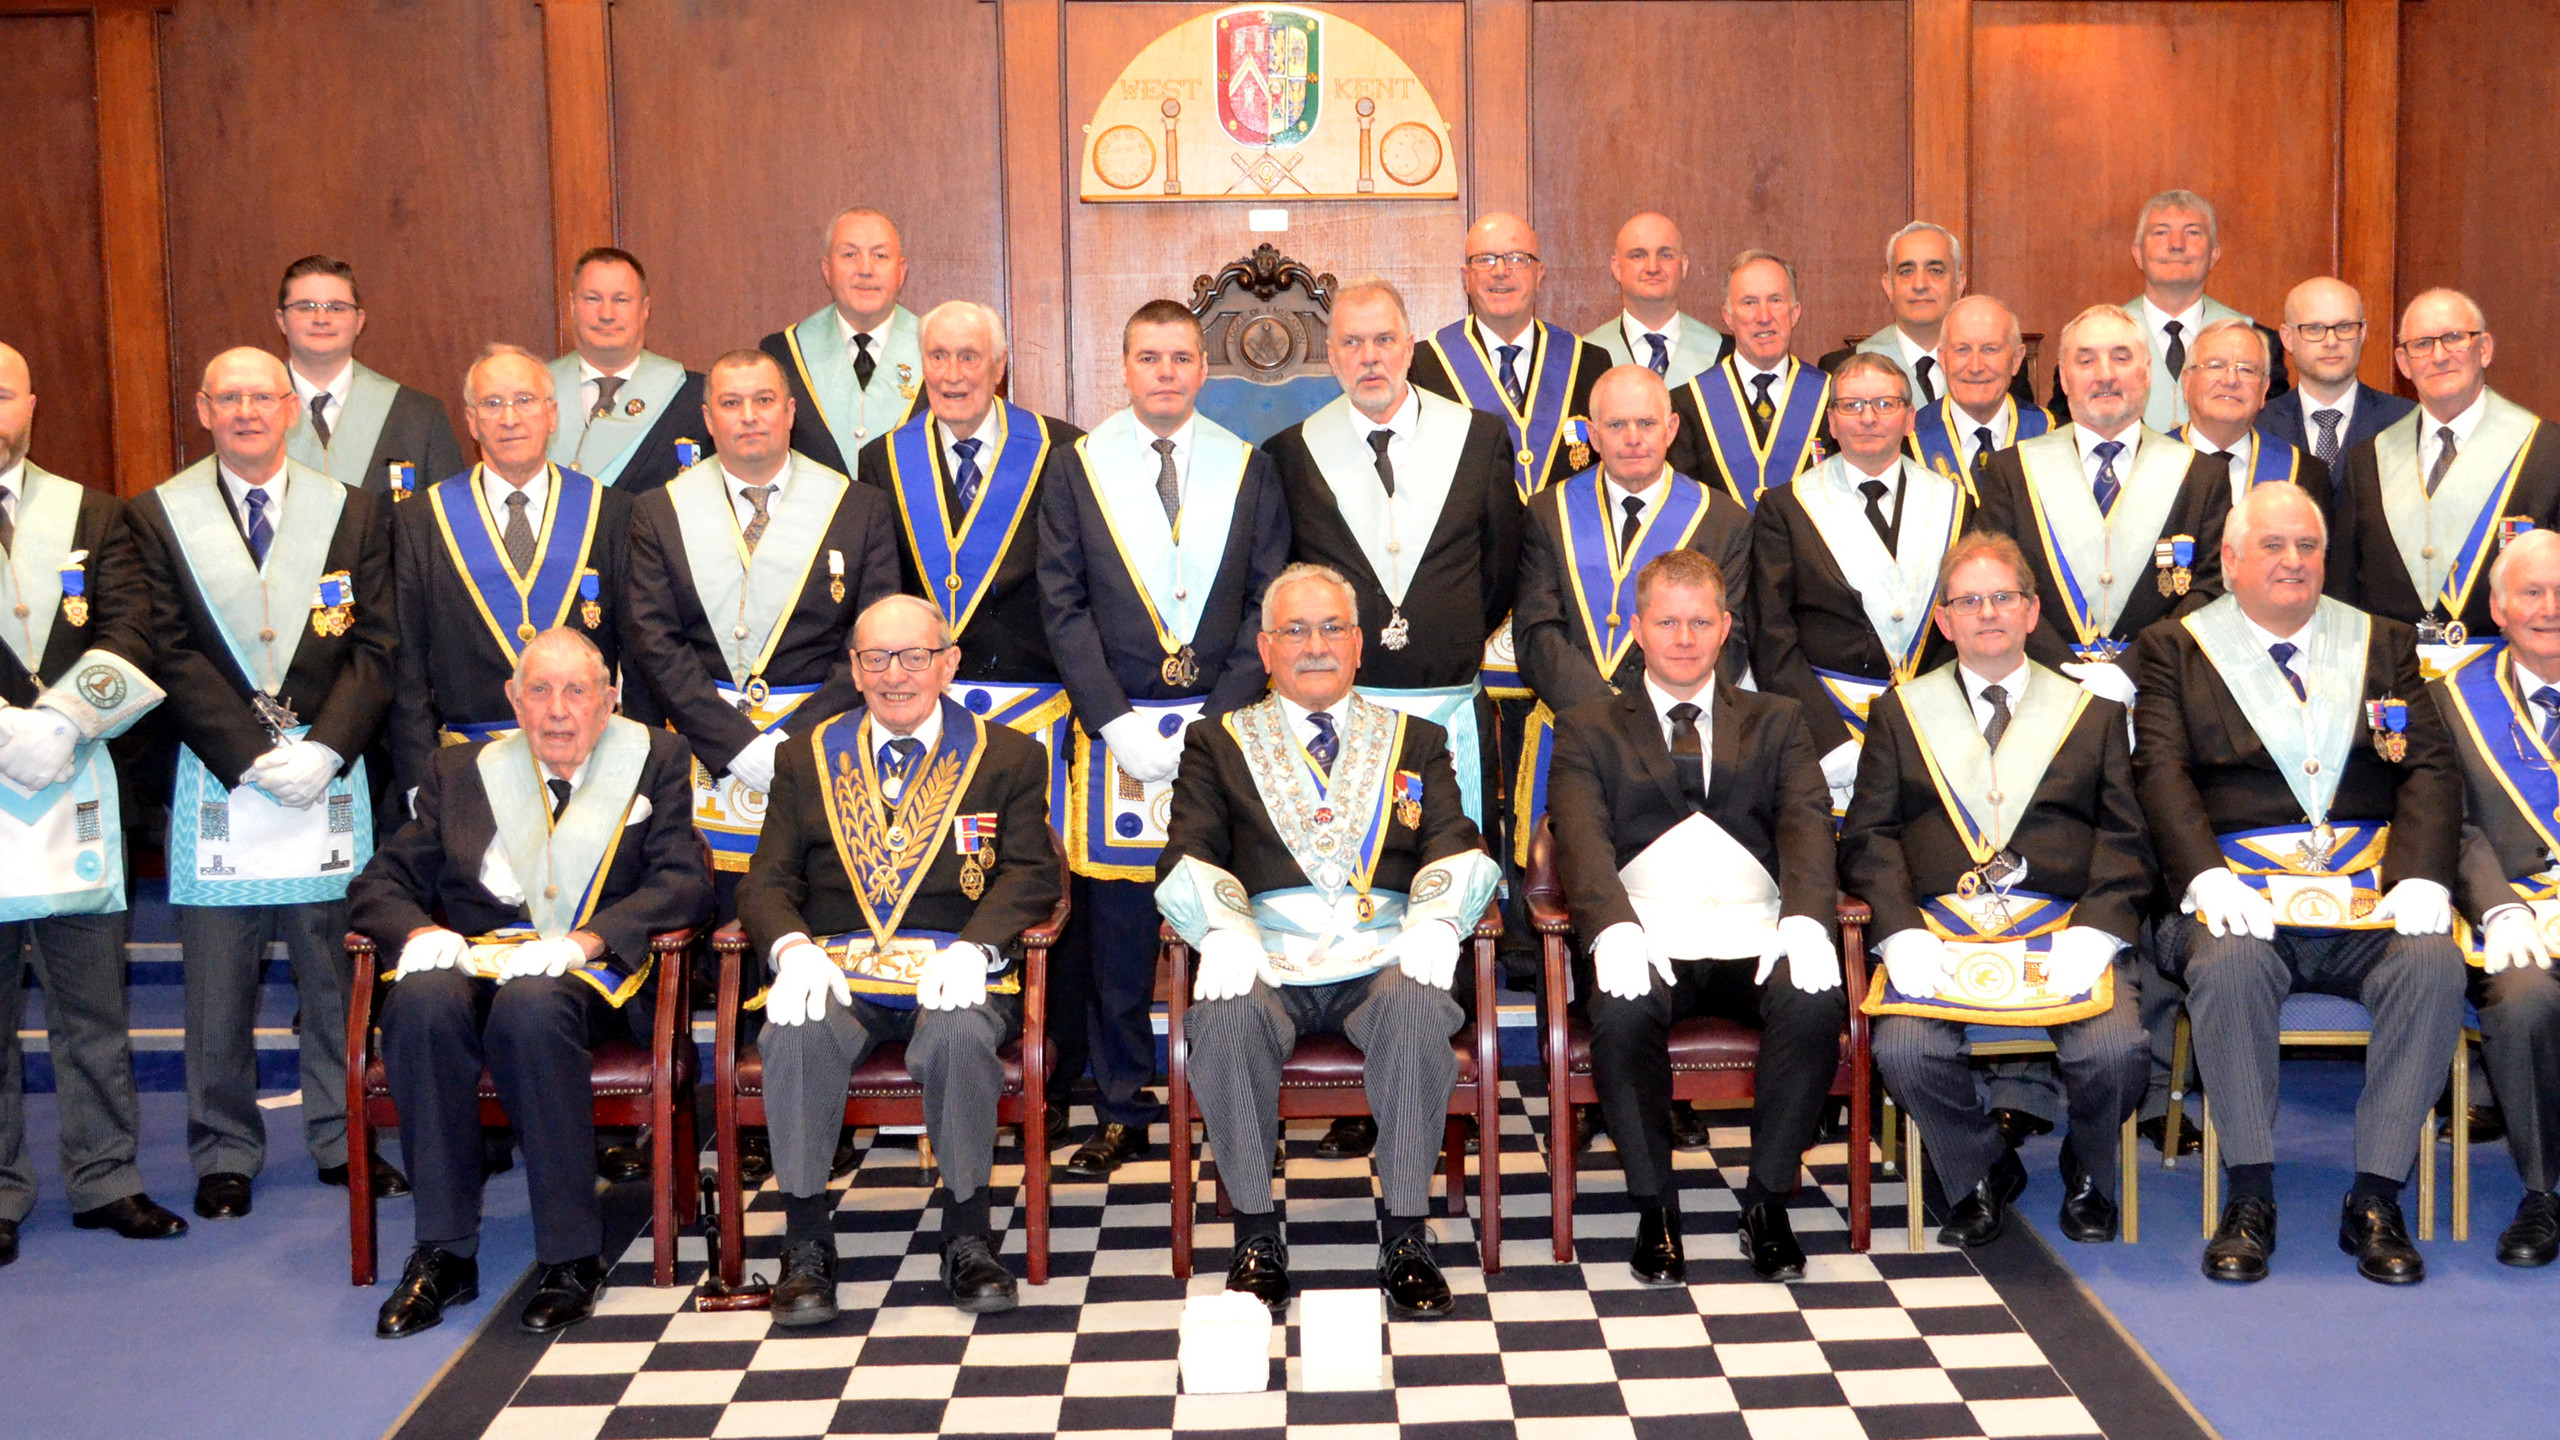 Members at 75th Anniversary